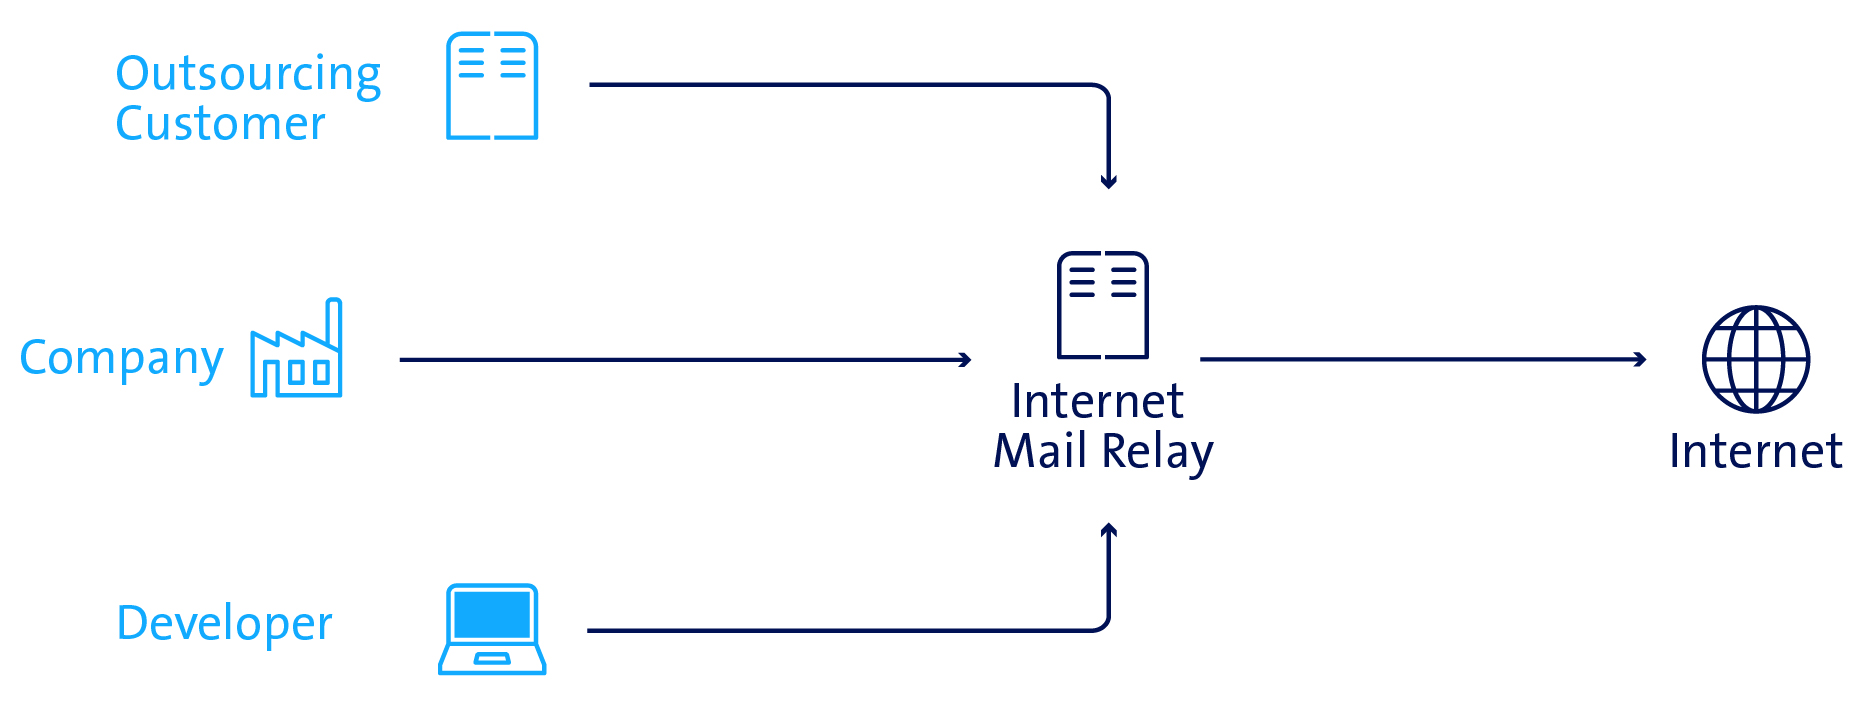 ent-sch-internet-mail-relay